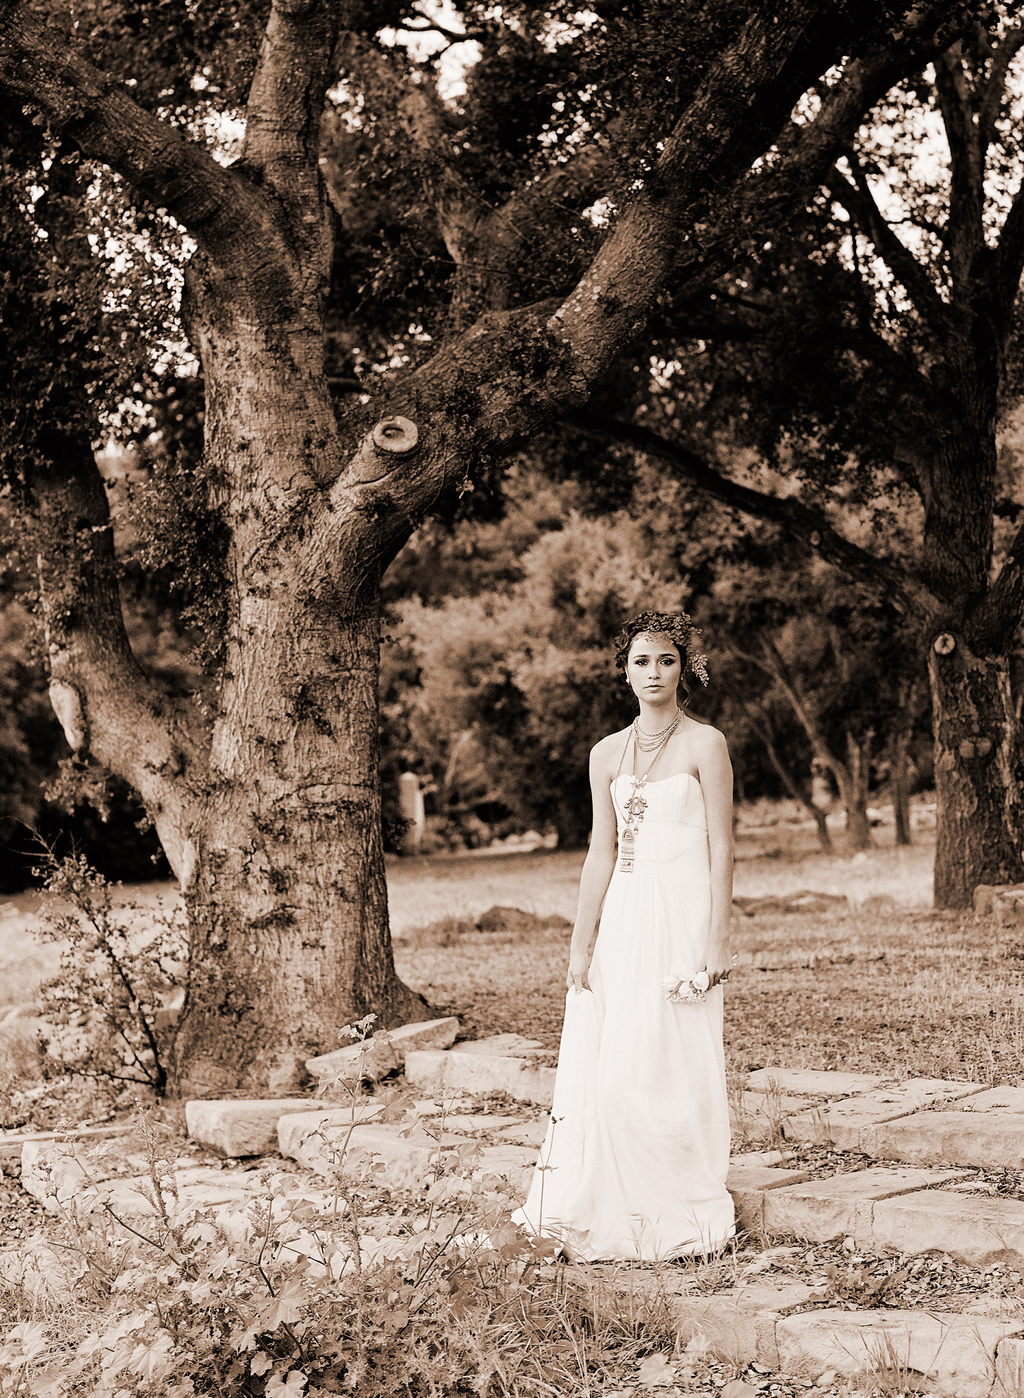 Styled-wedding-santa-barbara-chic-beaux-arts-phtographie-italian-bohemian-wedding-bride-wedding-dress-sepia-113.full